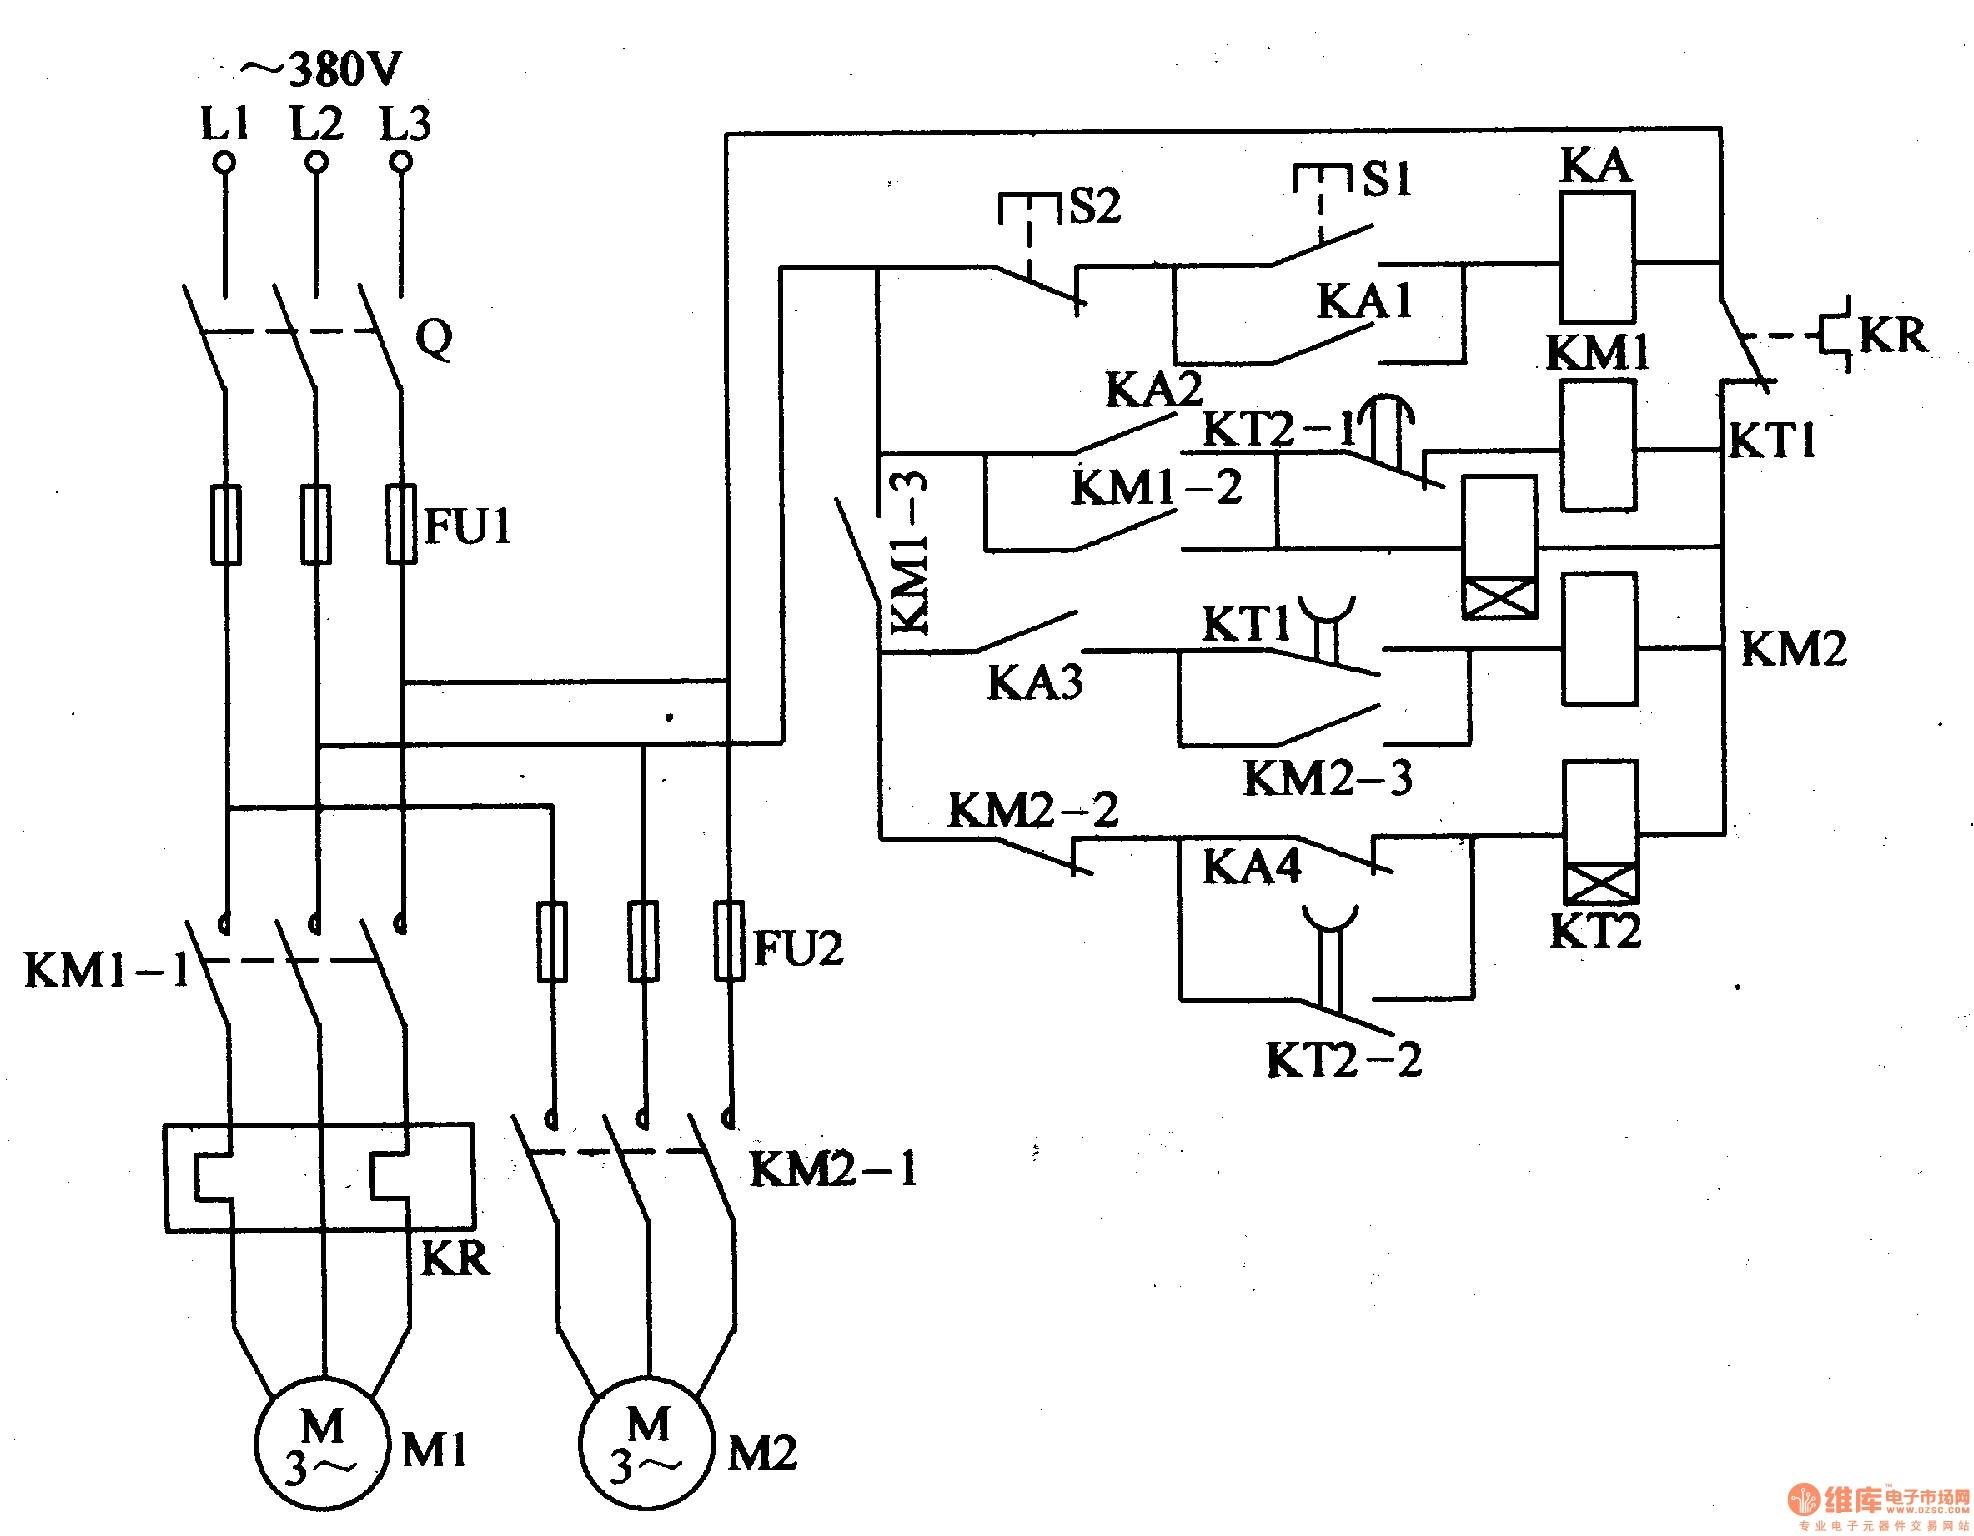 electrical control wiring books wiring diagram img e bike controller wiring diagram pdf control wiring books